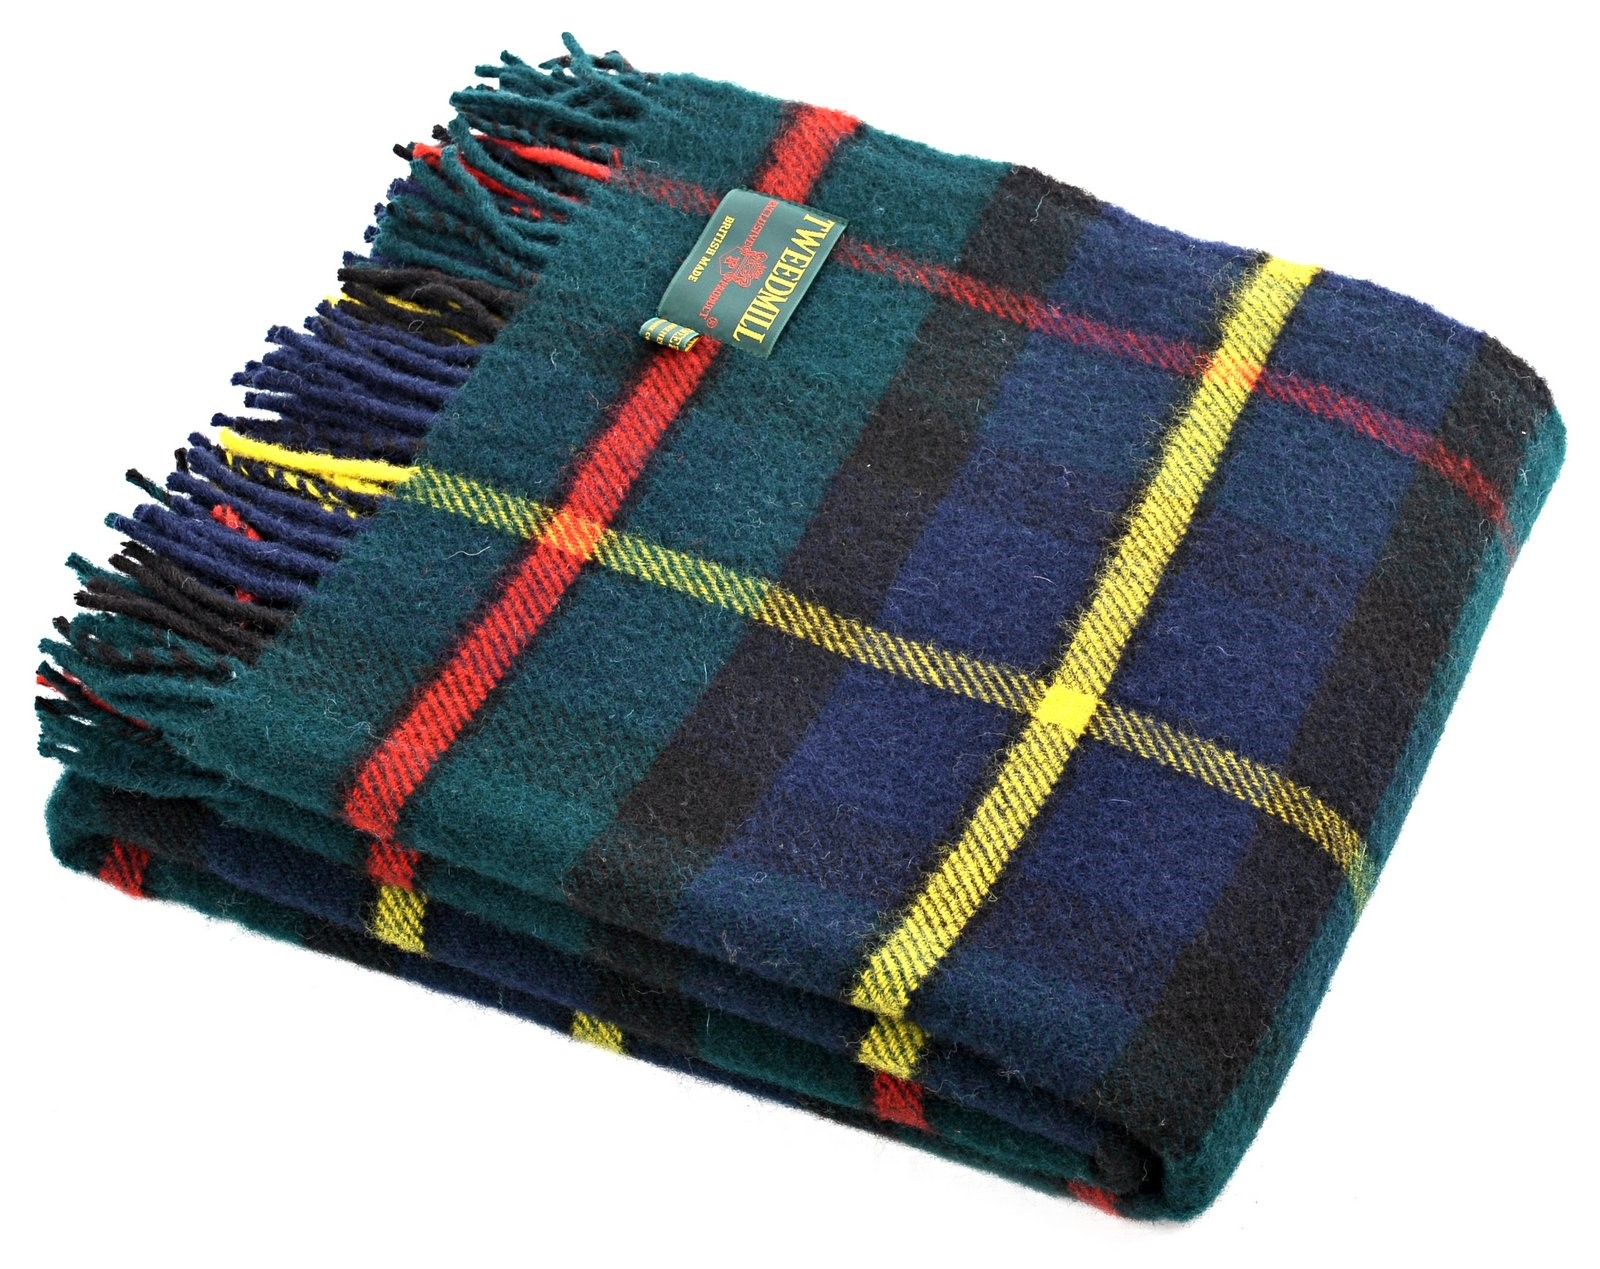 Wool Blanket Online British Made Gifts Hunting Macleod Tartan Picnic